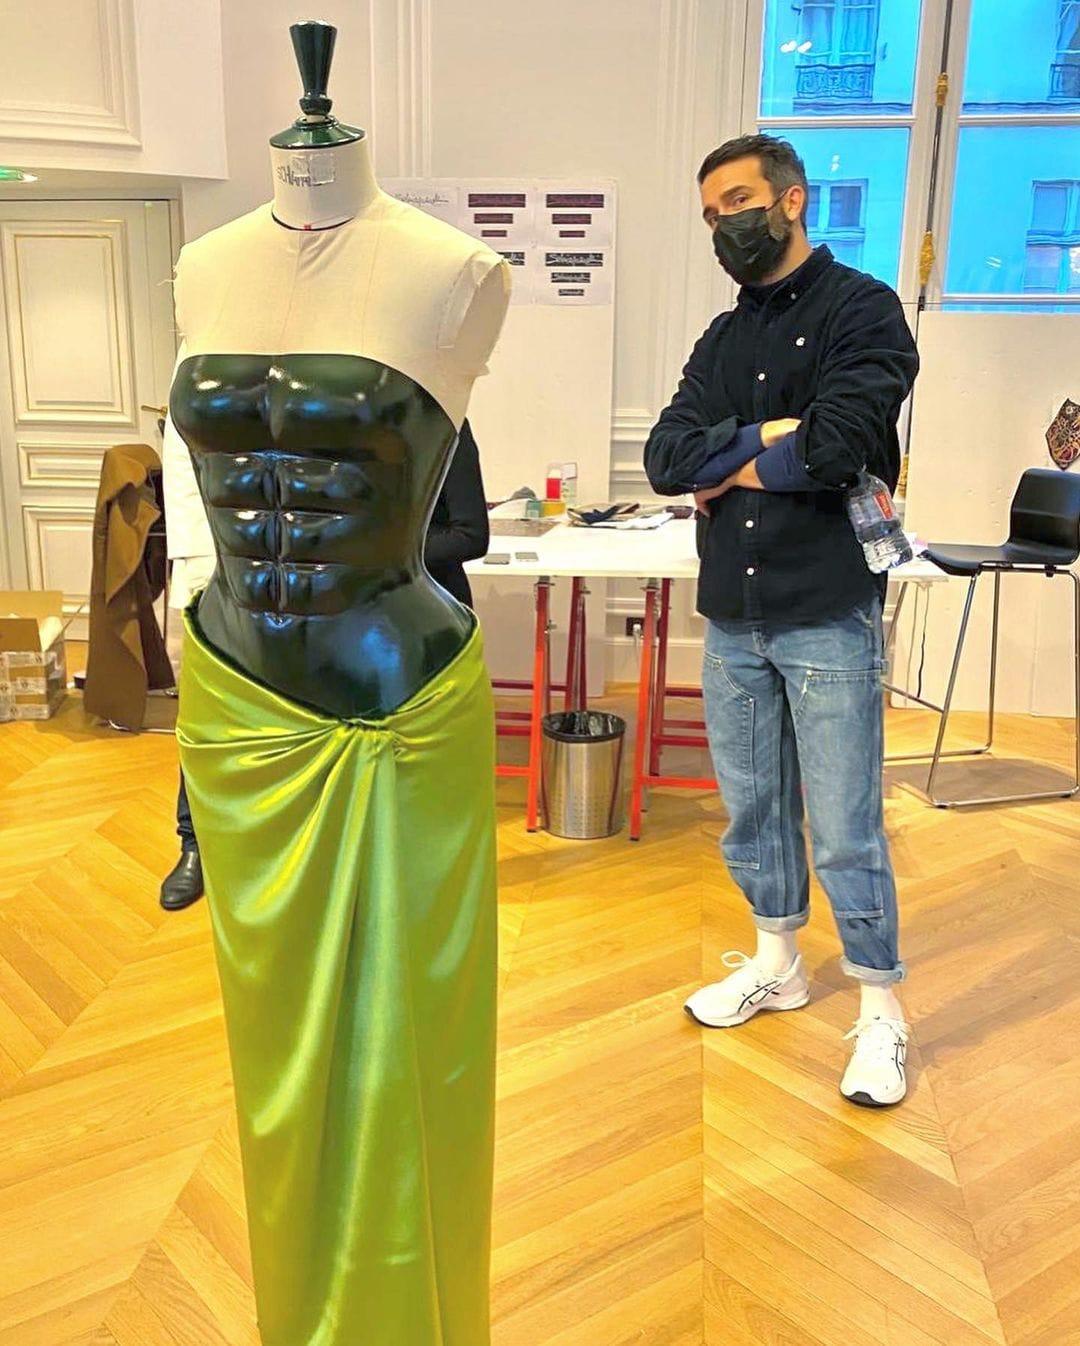 Daniel Roseberry for Kim Kardashian in custom Schiaparelli couture for Spring Summer 2021. RUNWAY MAGAZINE ® Collections. RUNWAY NOW / RUNWAY NEW